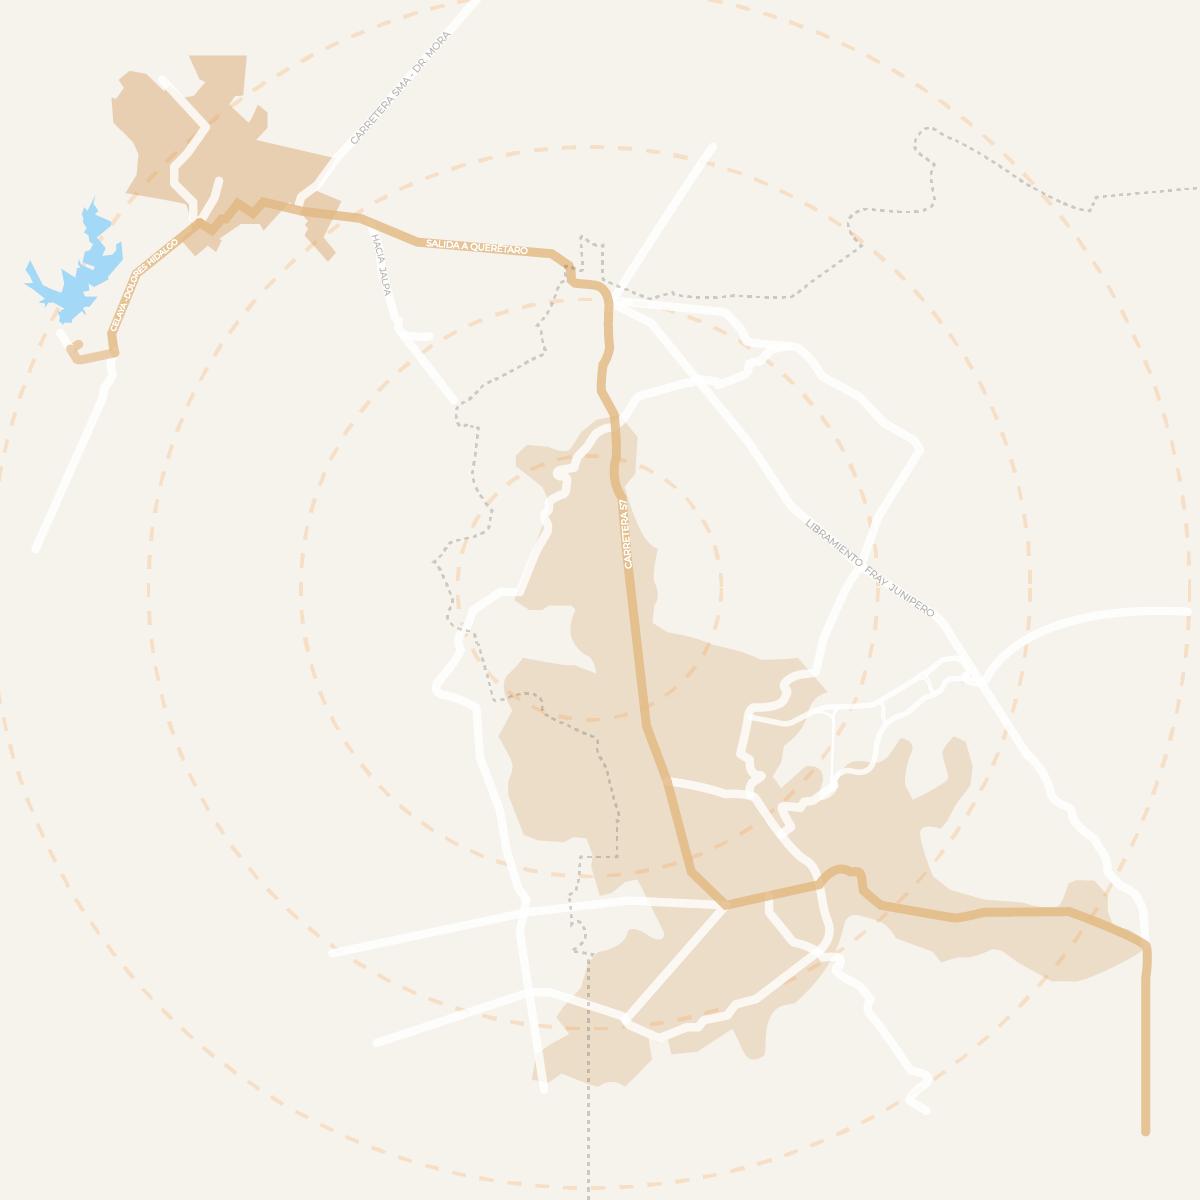 https://i0.wp.com/gbh.mx/wp-content/uploads/2021/06/mapa-pb-2.png?fit=1200%2C1200&ssl=1